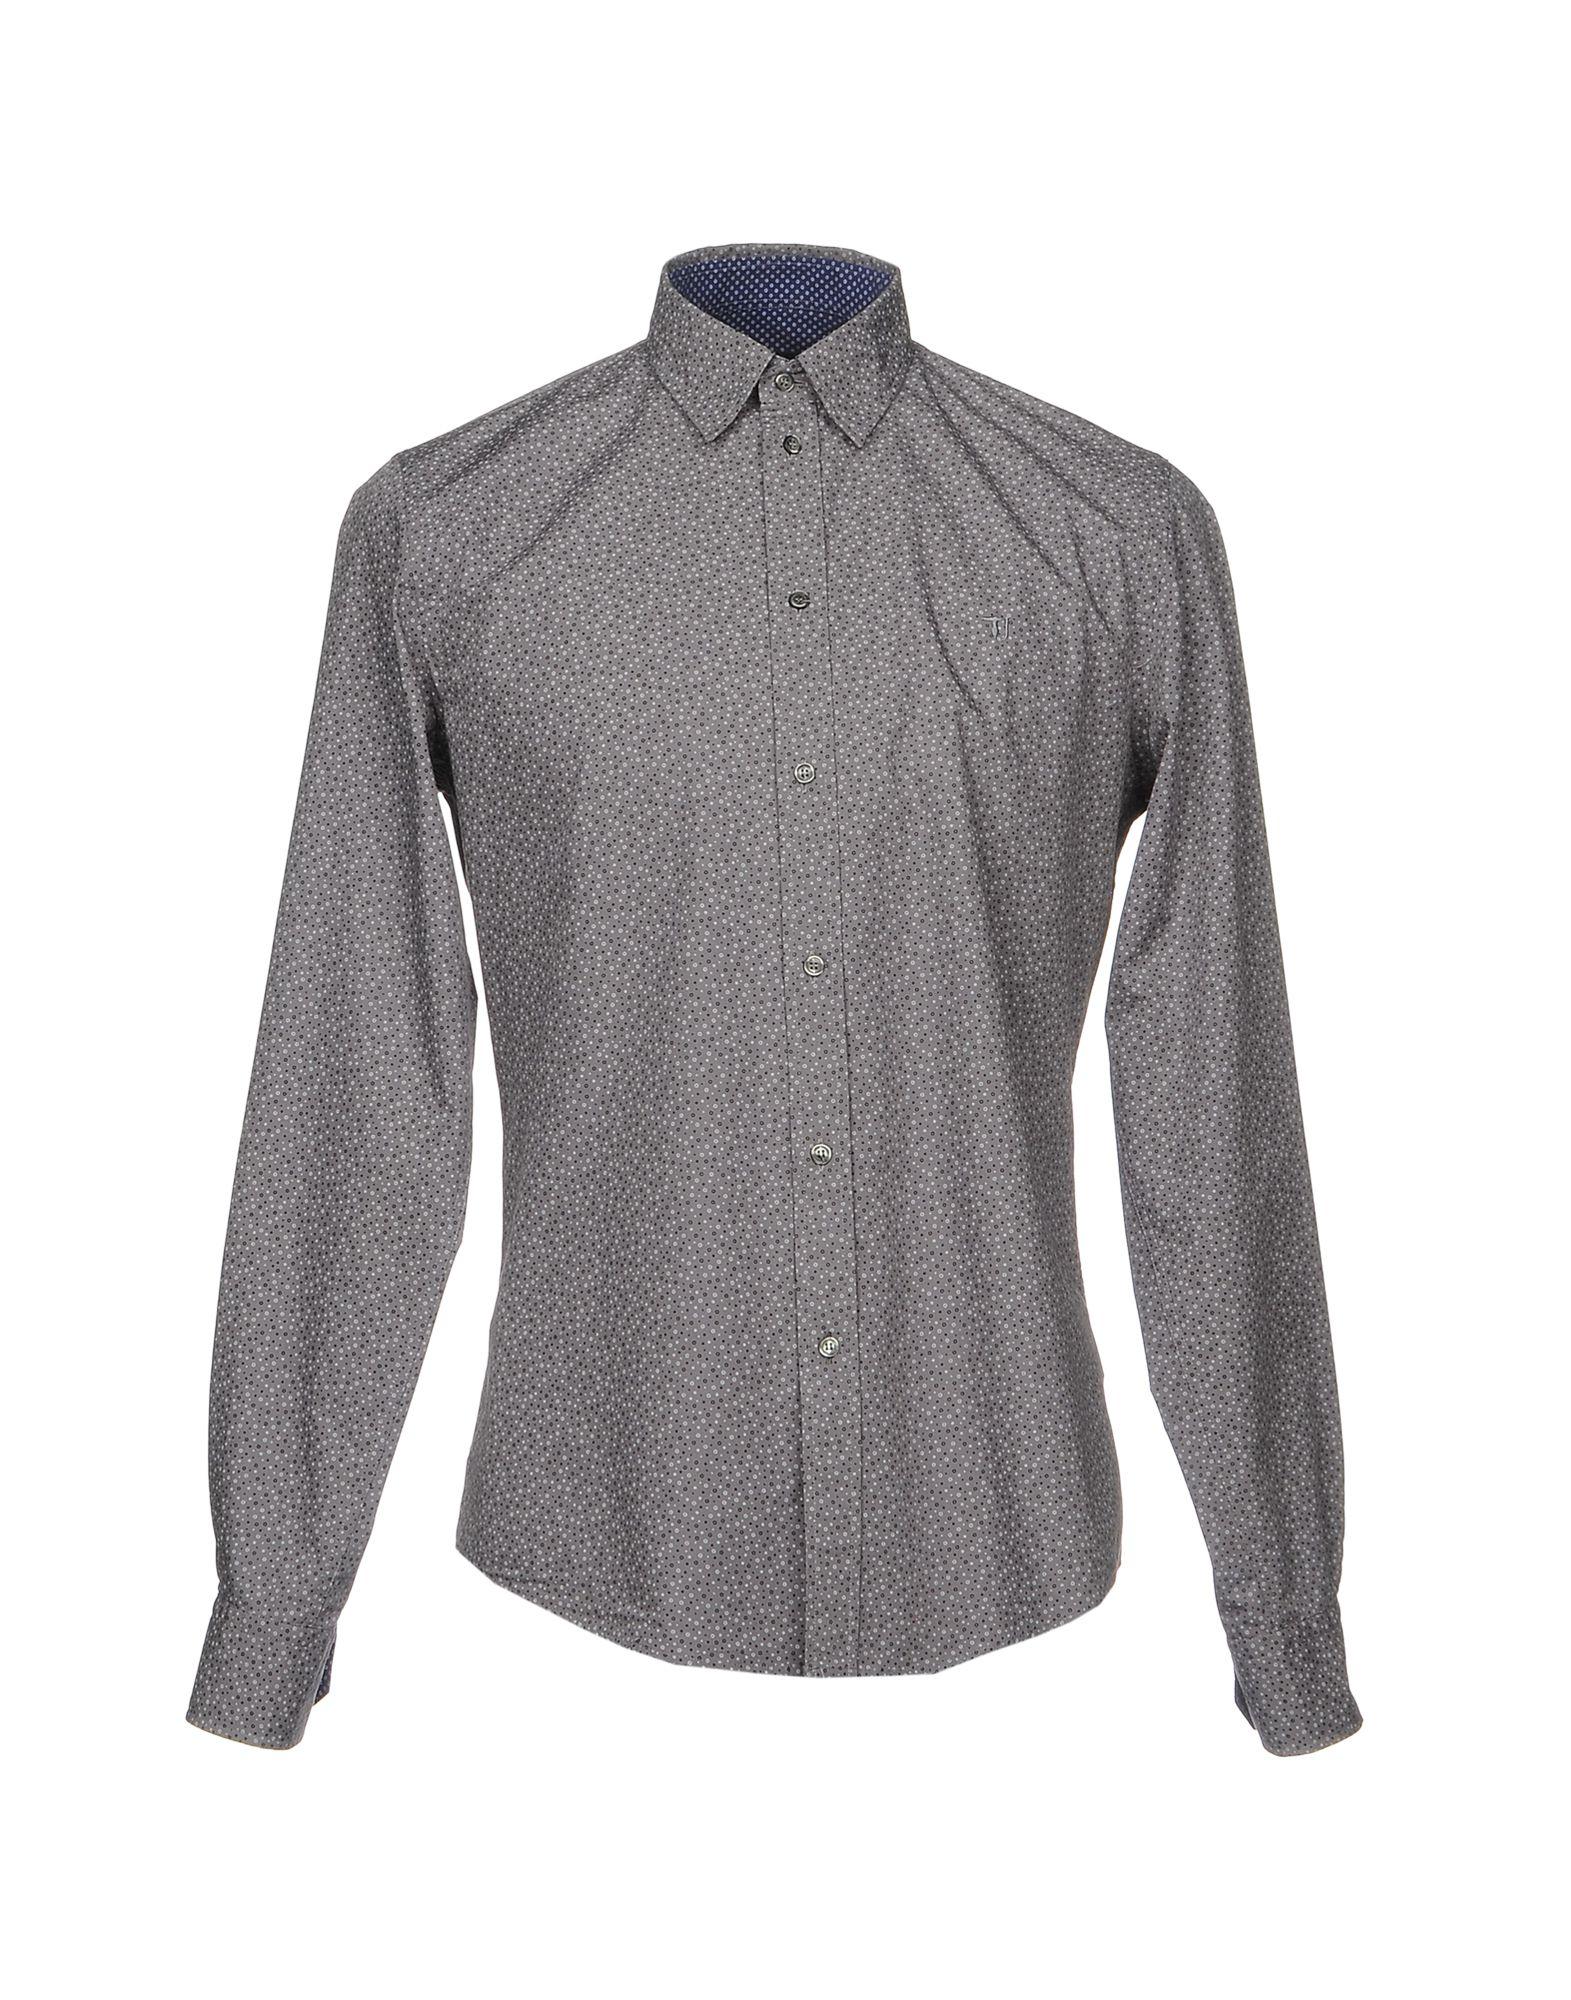 Camicia Fantasia Trussardi Jeans Uomo - 38691662NJ 38691662NJ - b79d0b